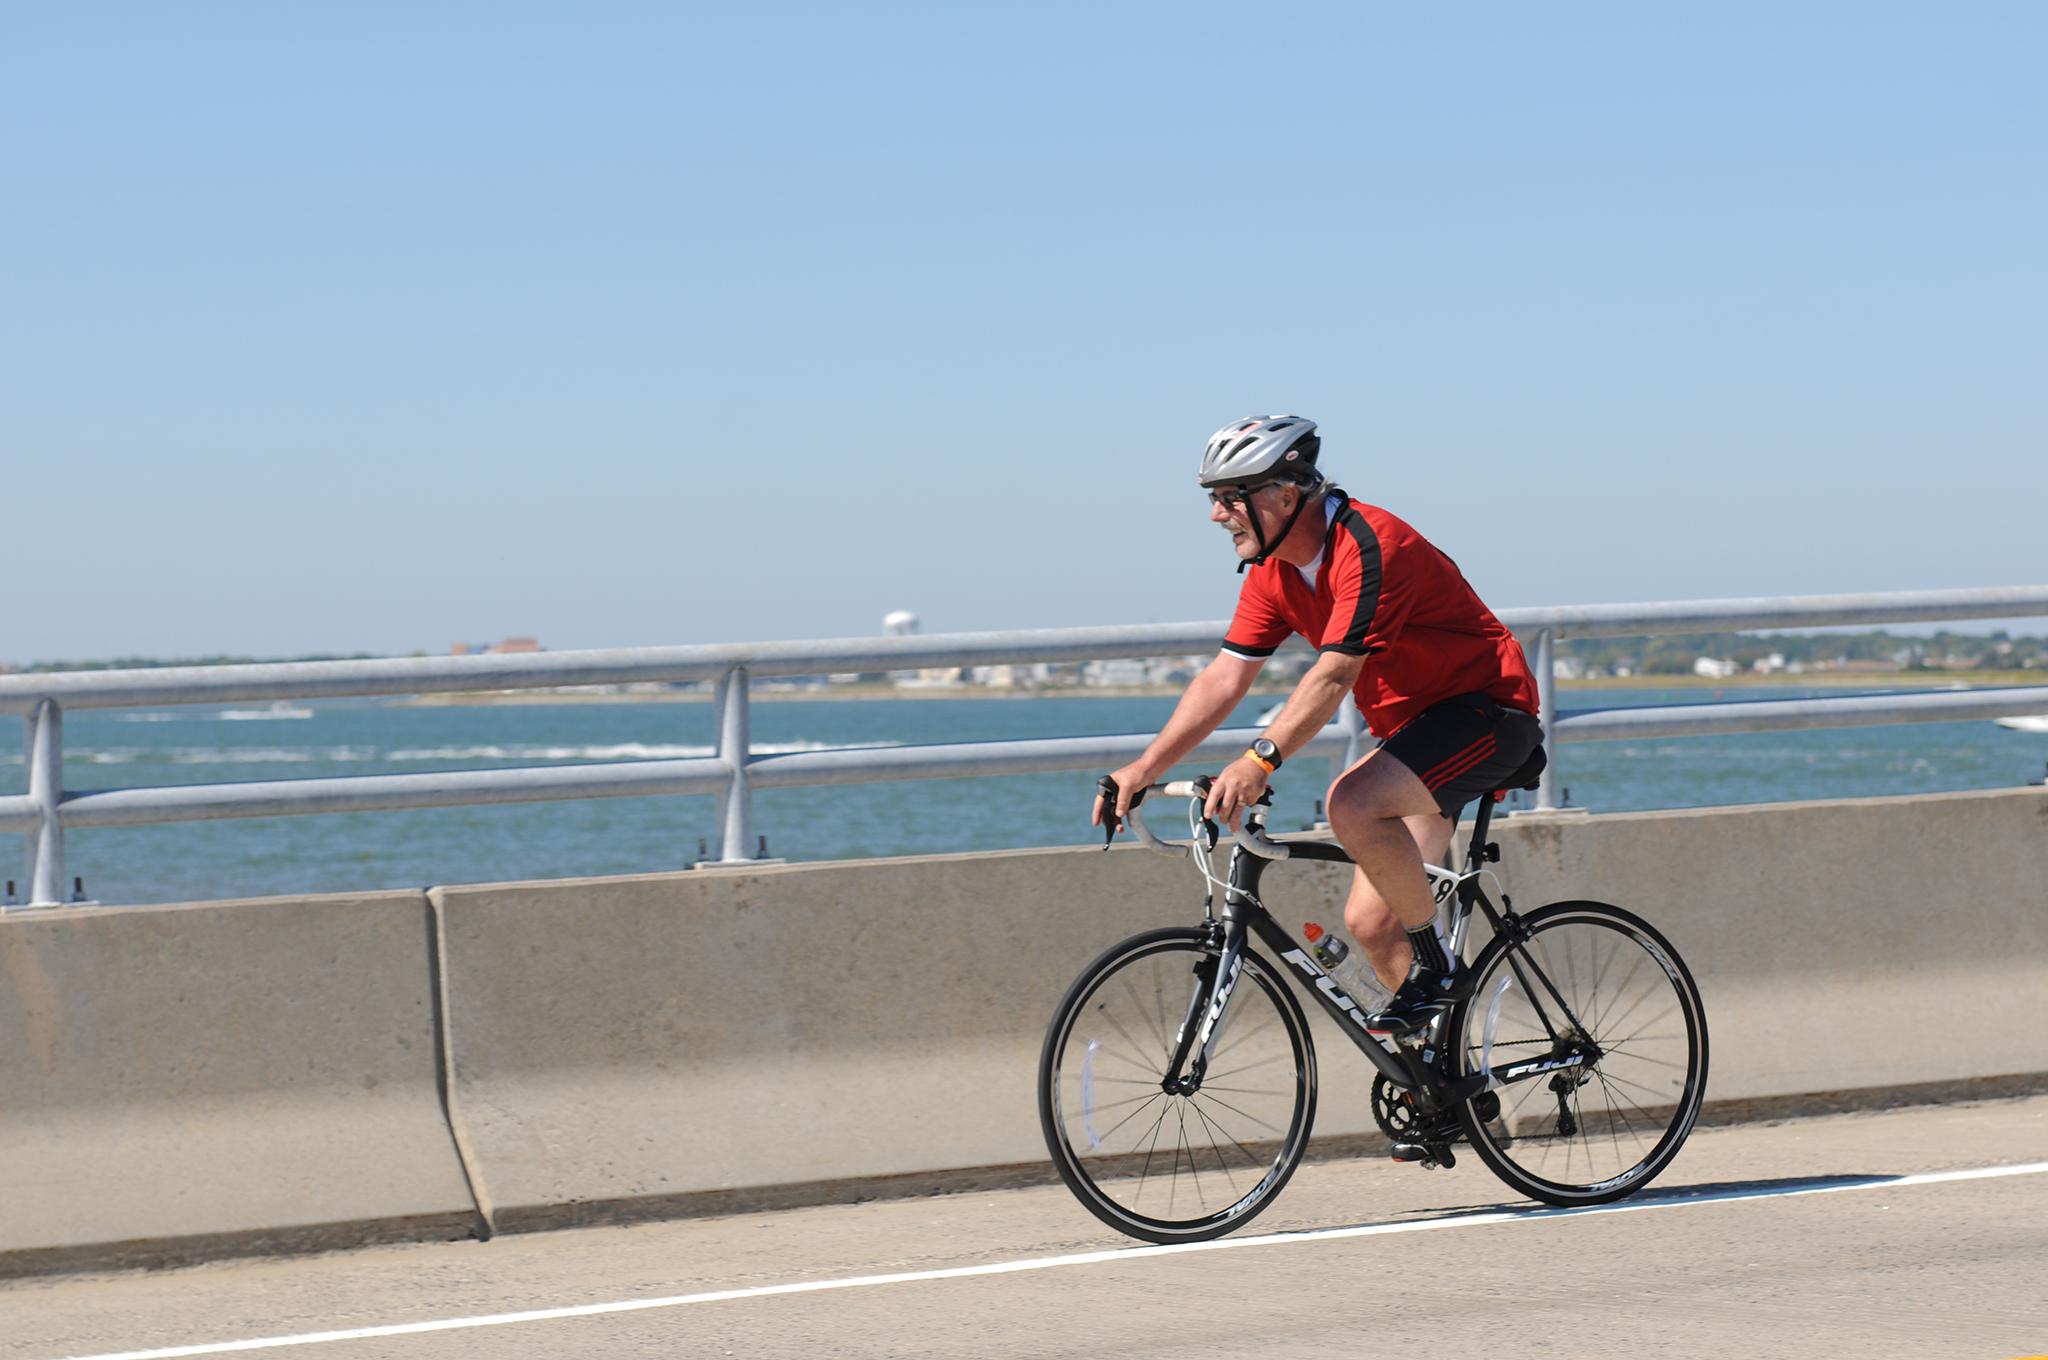 Ride bikes